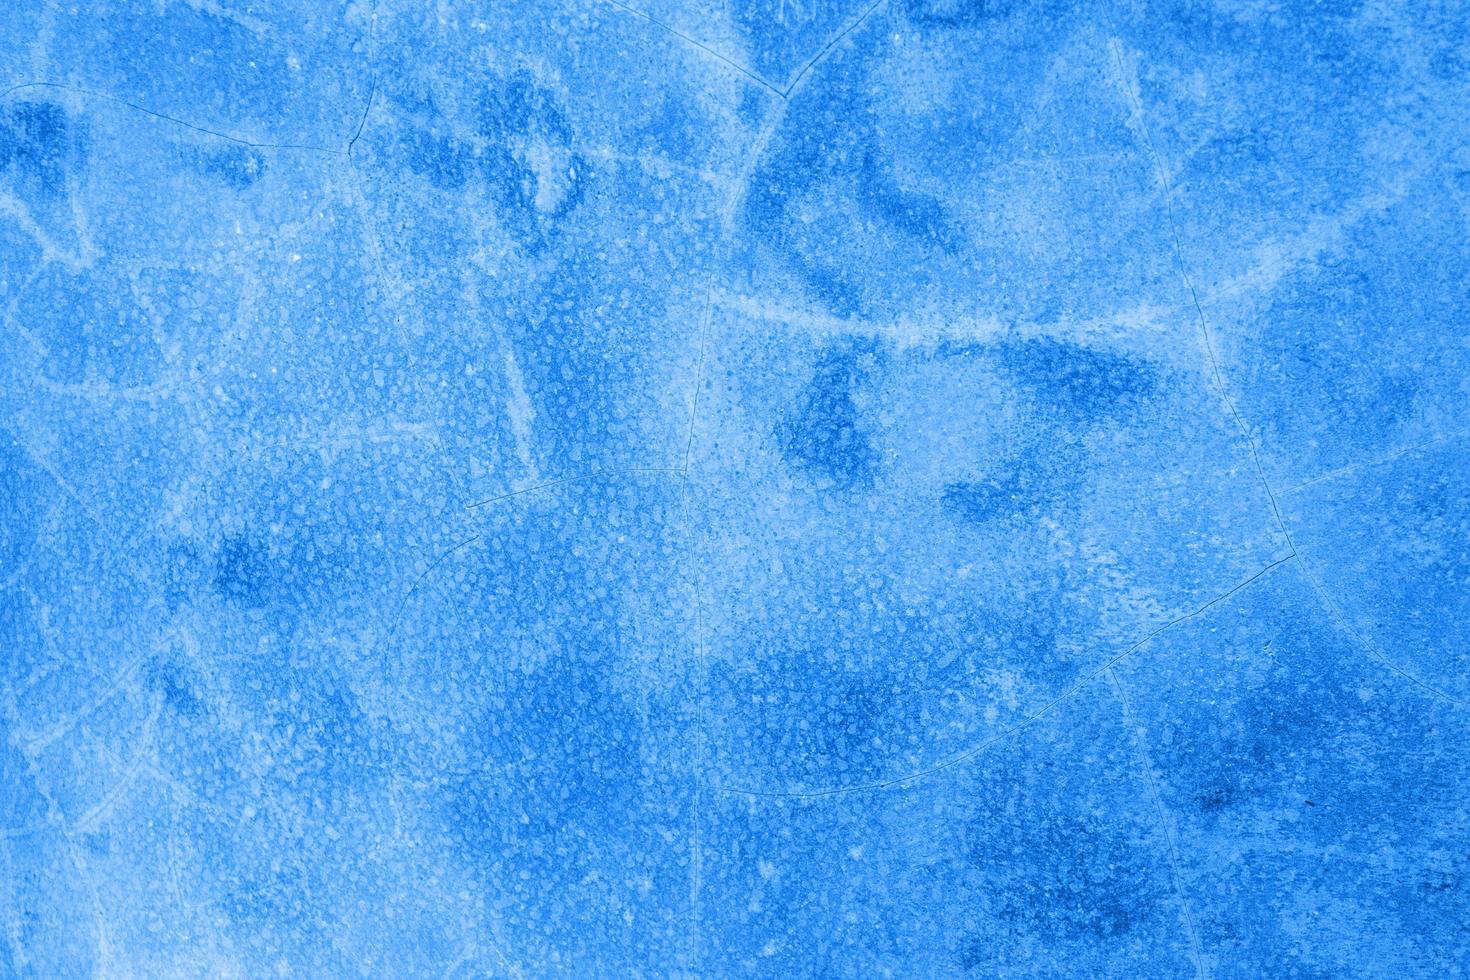 Blue pool water photo